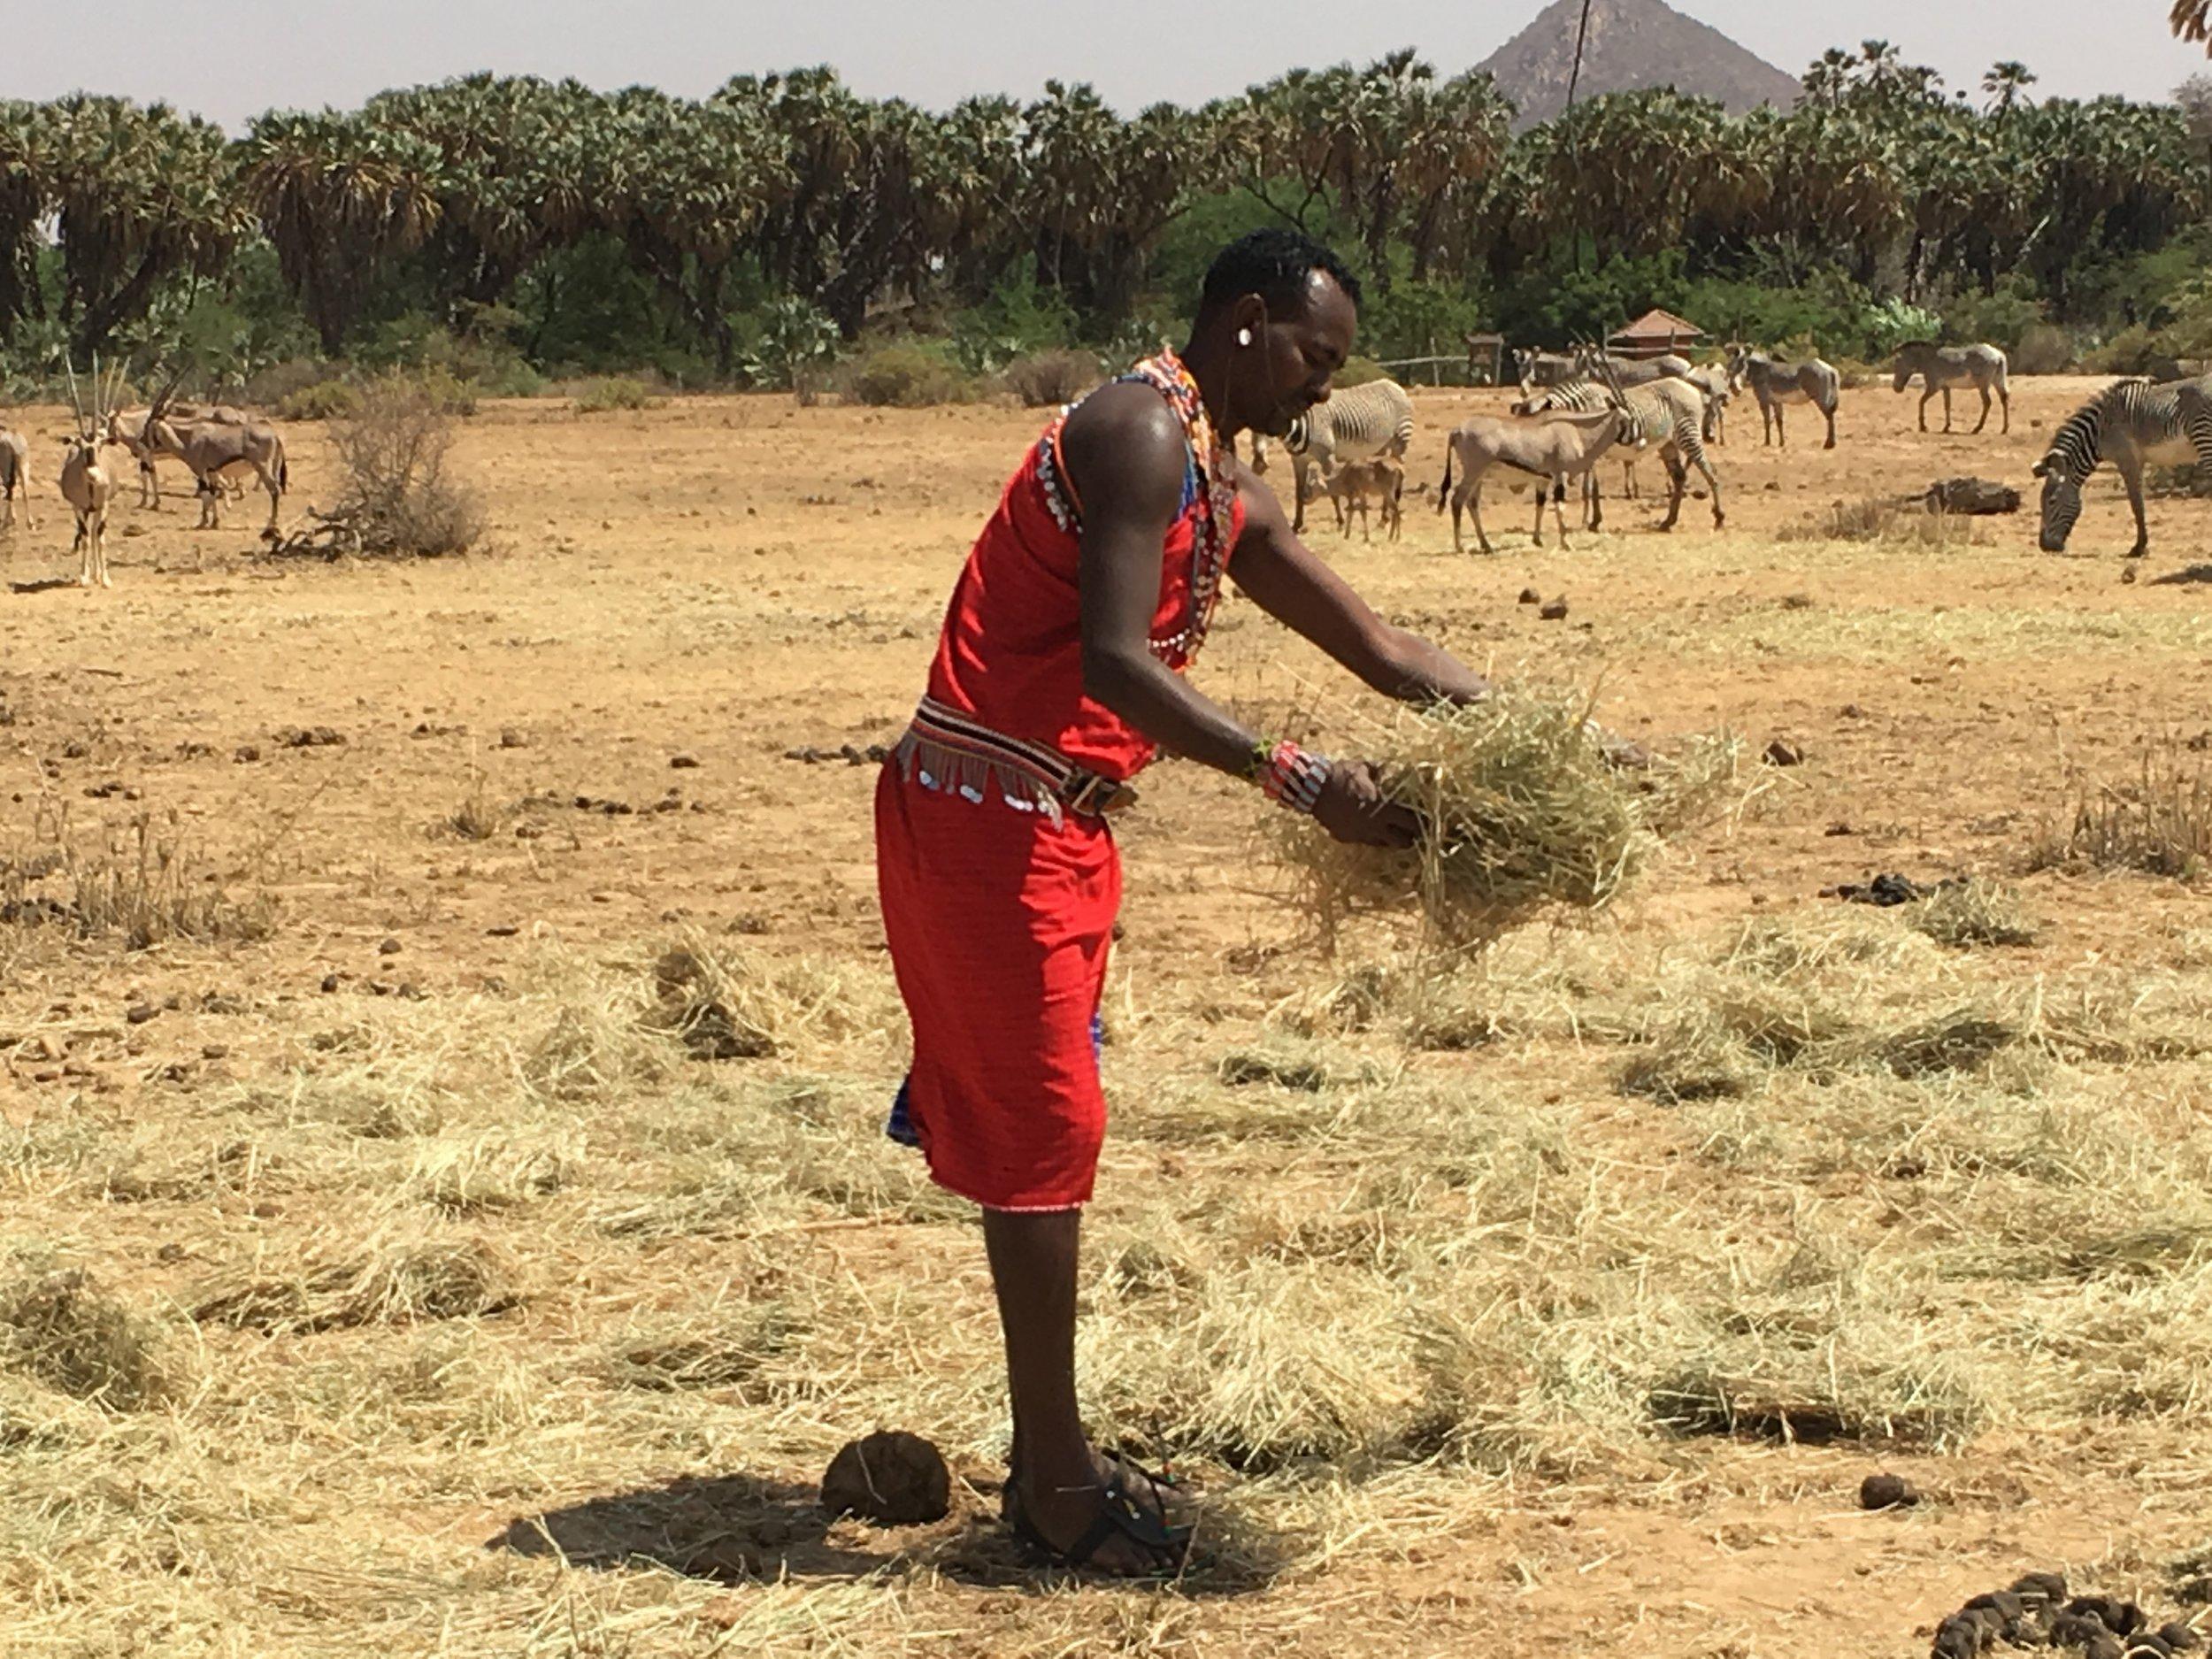 Samburu in Northern Kenya